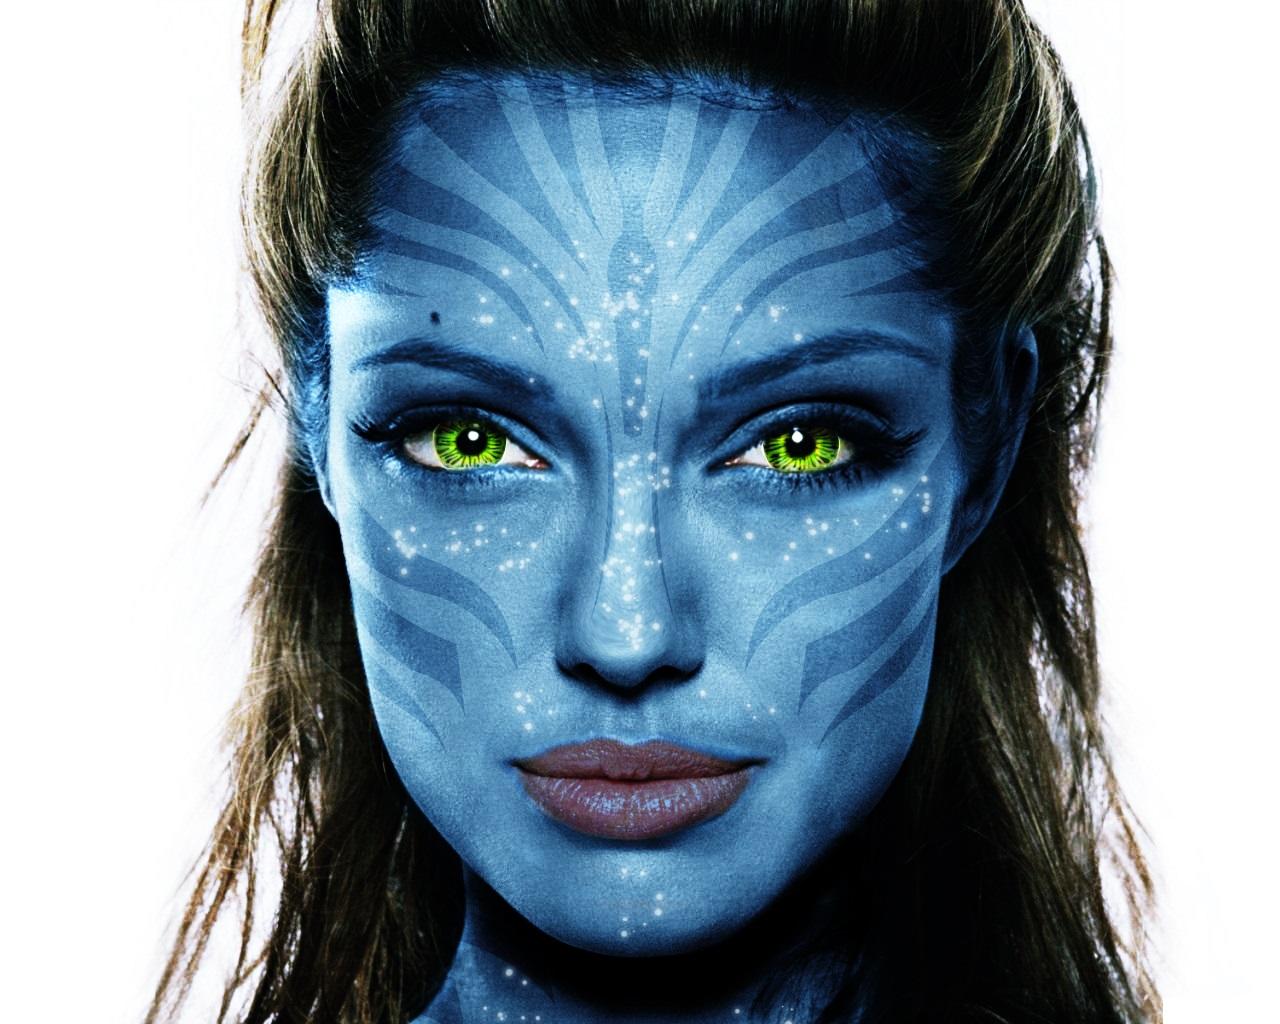 Navi Avatar Angelina Jolie By Mad Midna